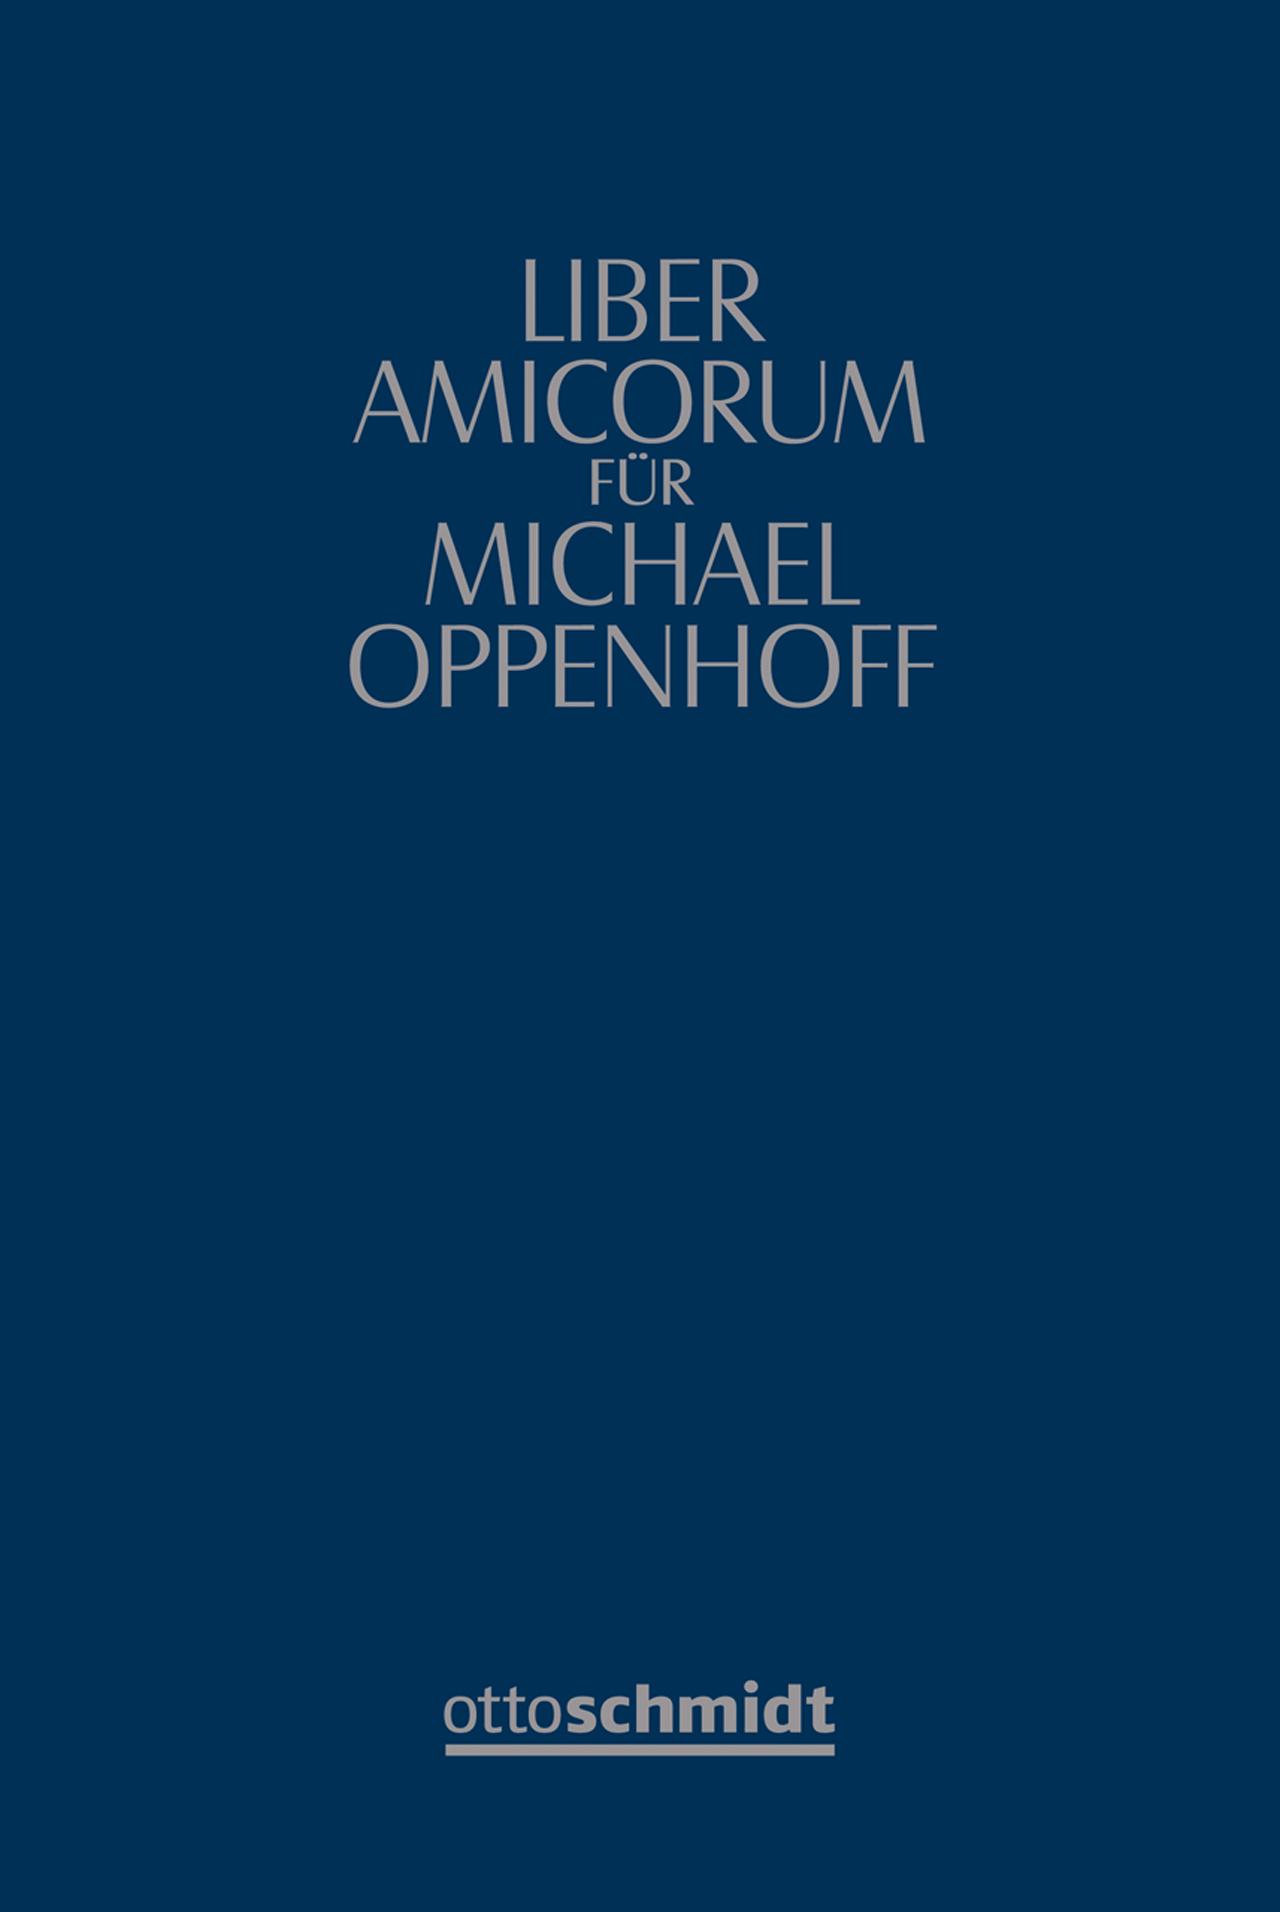 Liber-amicorum-Michael-Oppenhoff-Hanno-Goltz-Dr-9783504060473